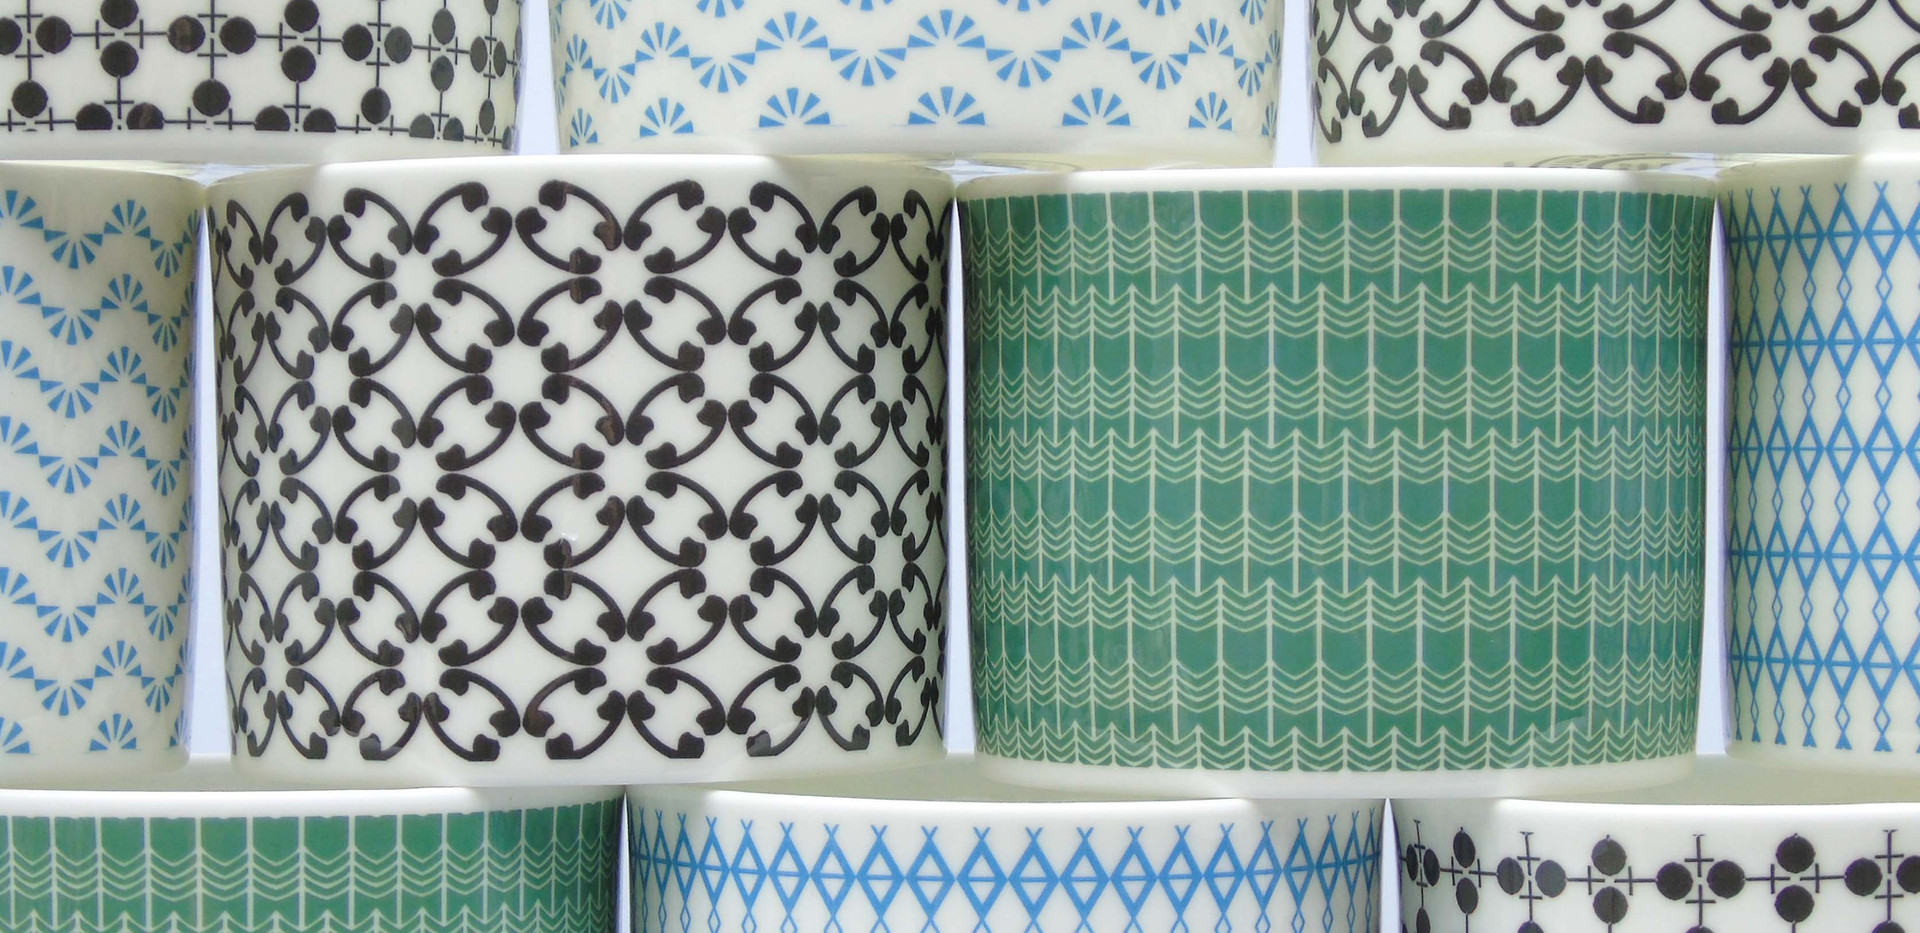 mug pattern close up 2.jpg